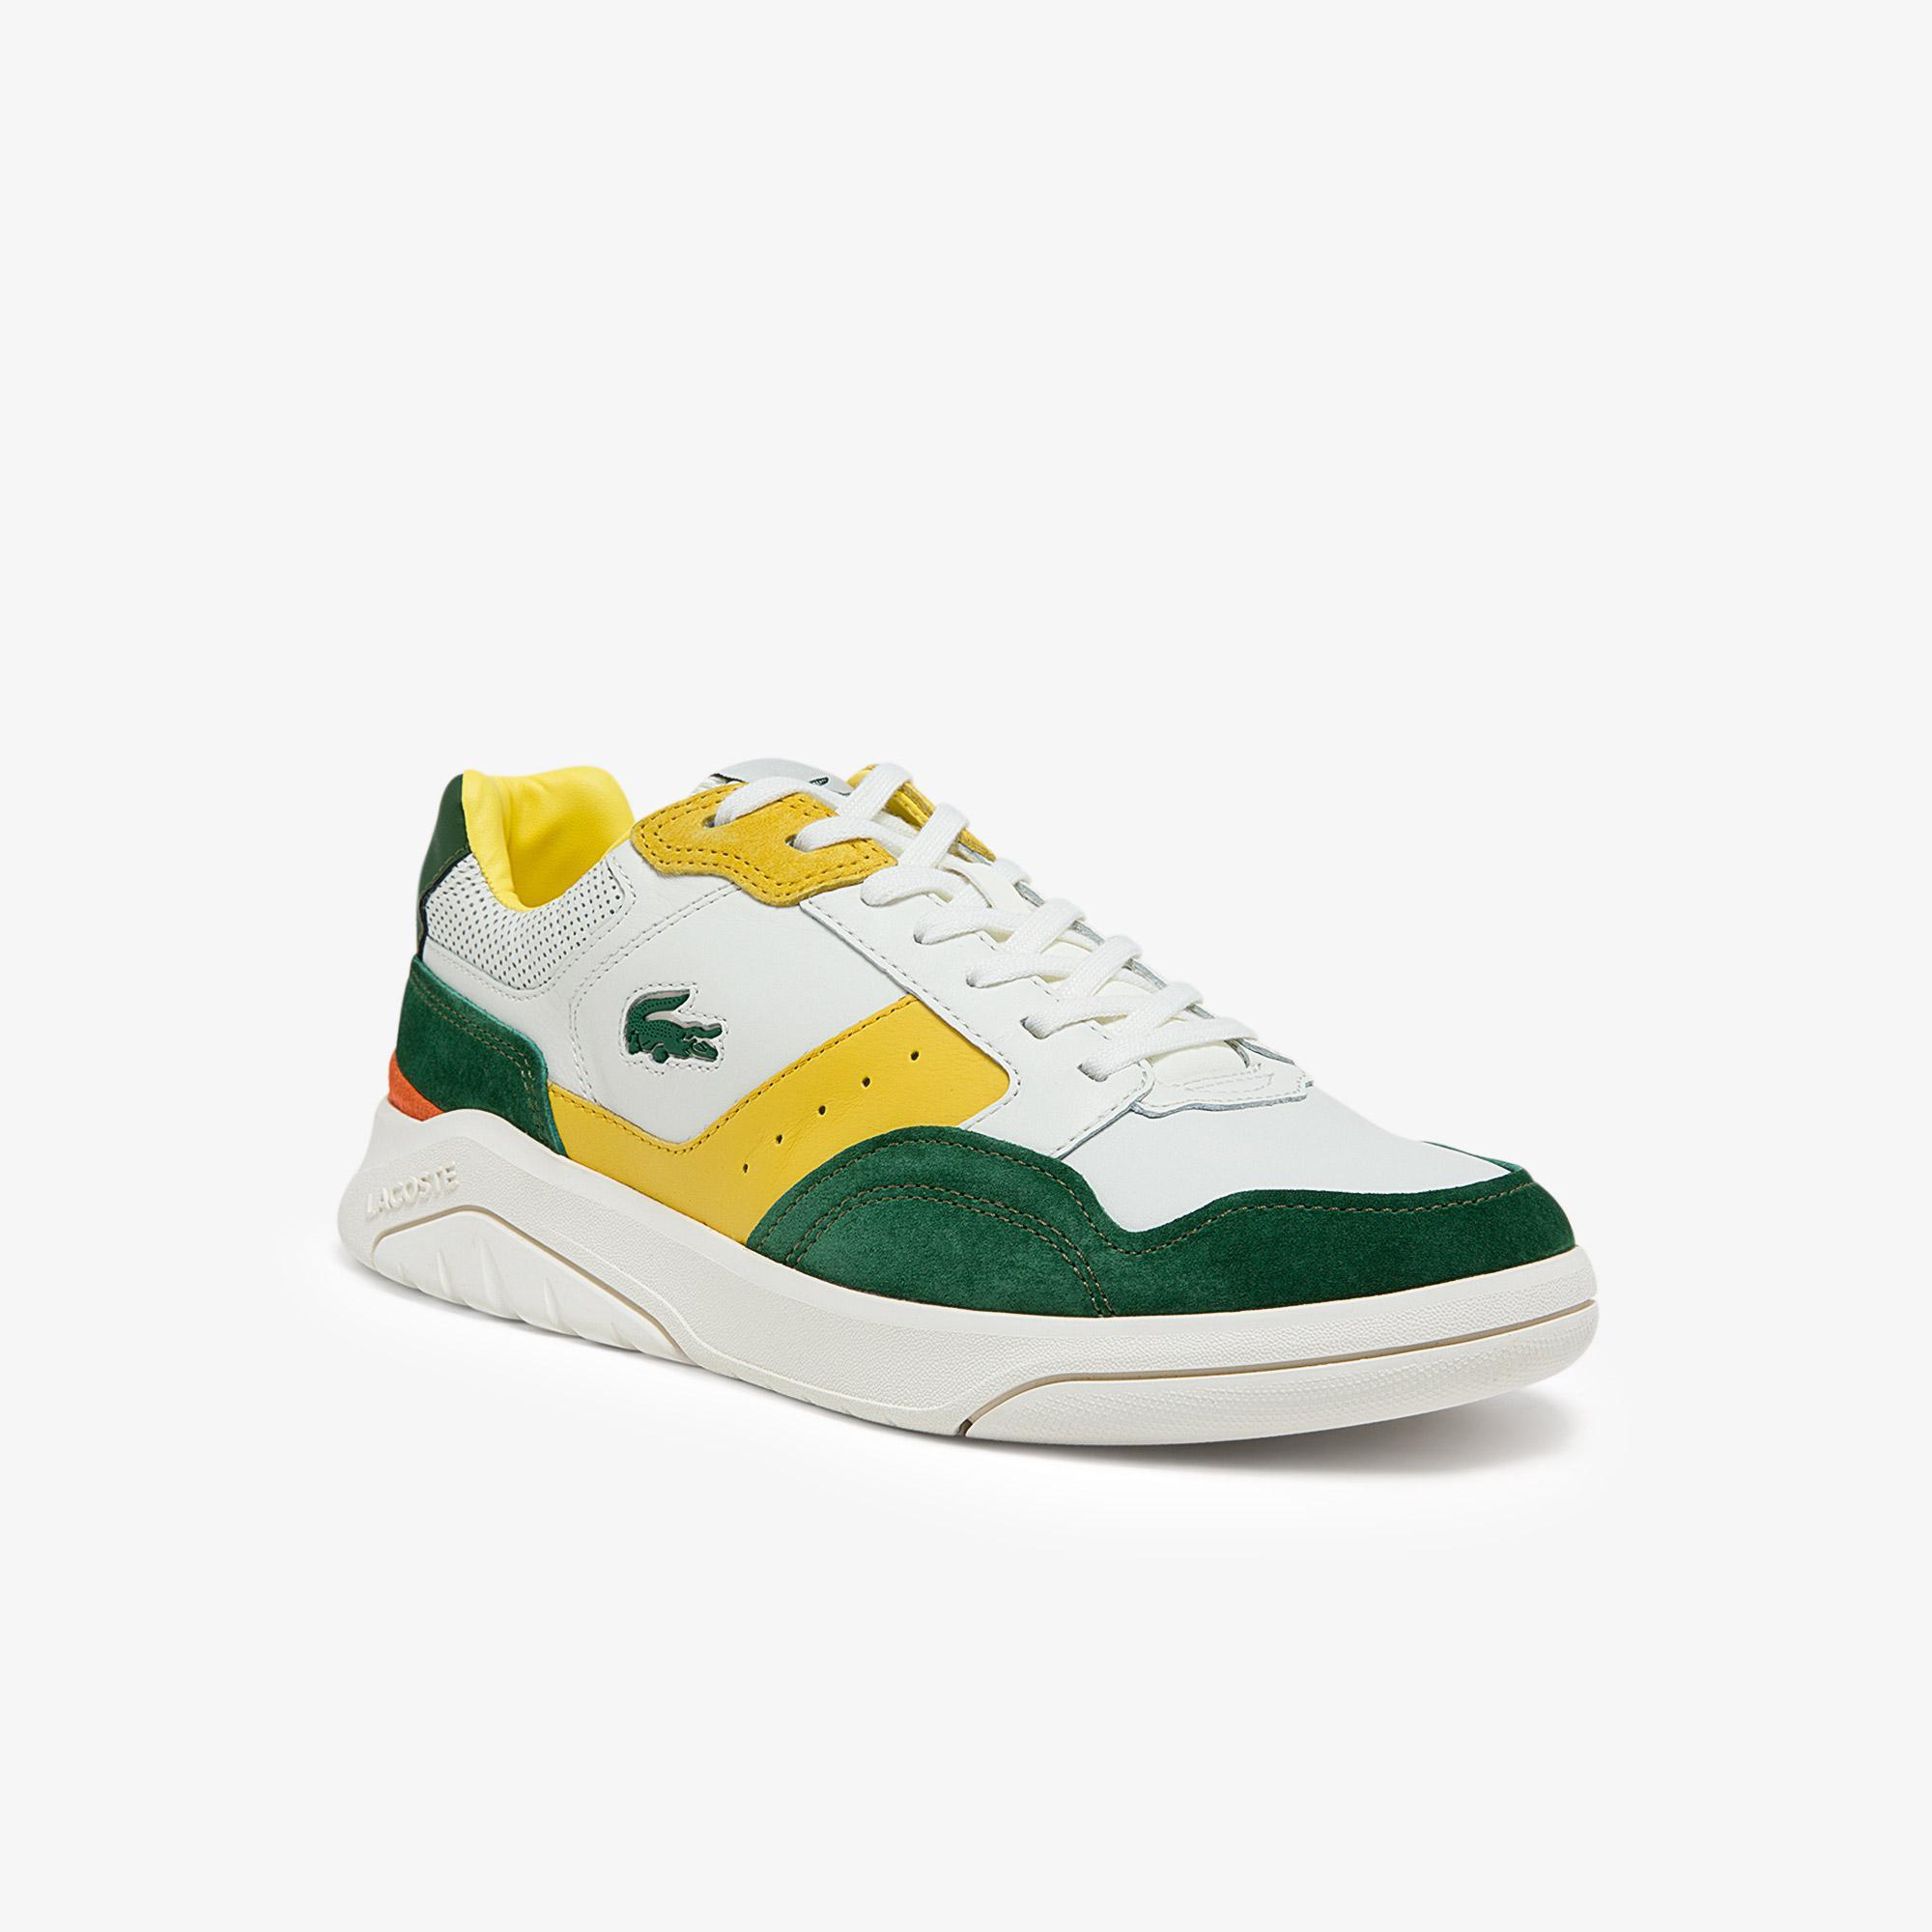 Lacoste Game Advance Luxe 01211 Sma Erkek Deri Beyaz - Yeşil Sneaker